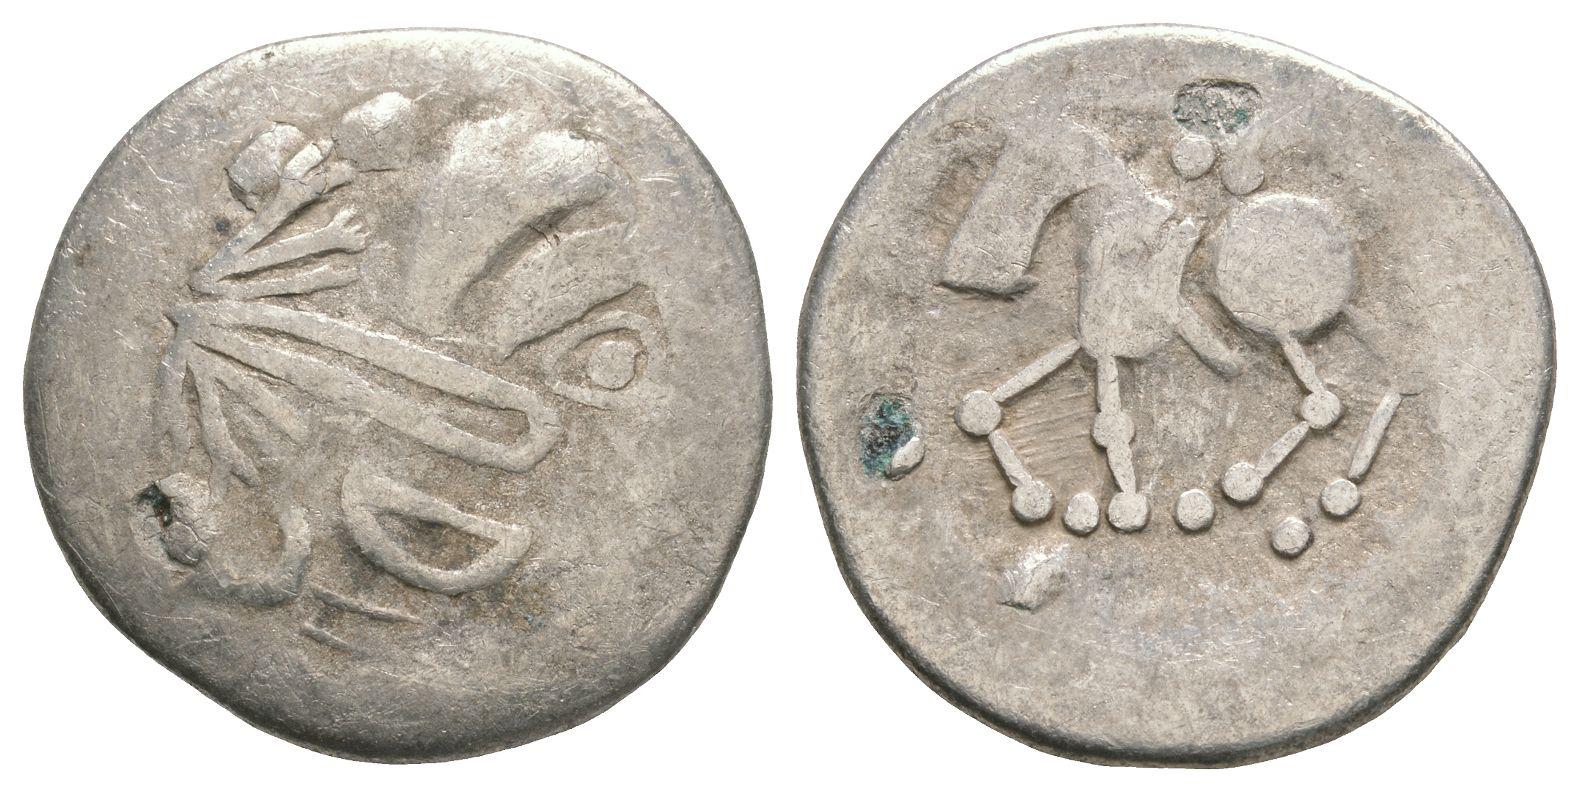 Celtic Iron Age Coins - Danubian Celts - Sattelkopf Tetradrachm